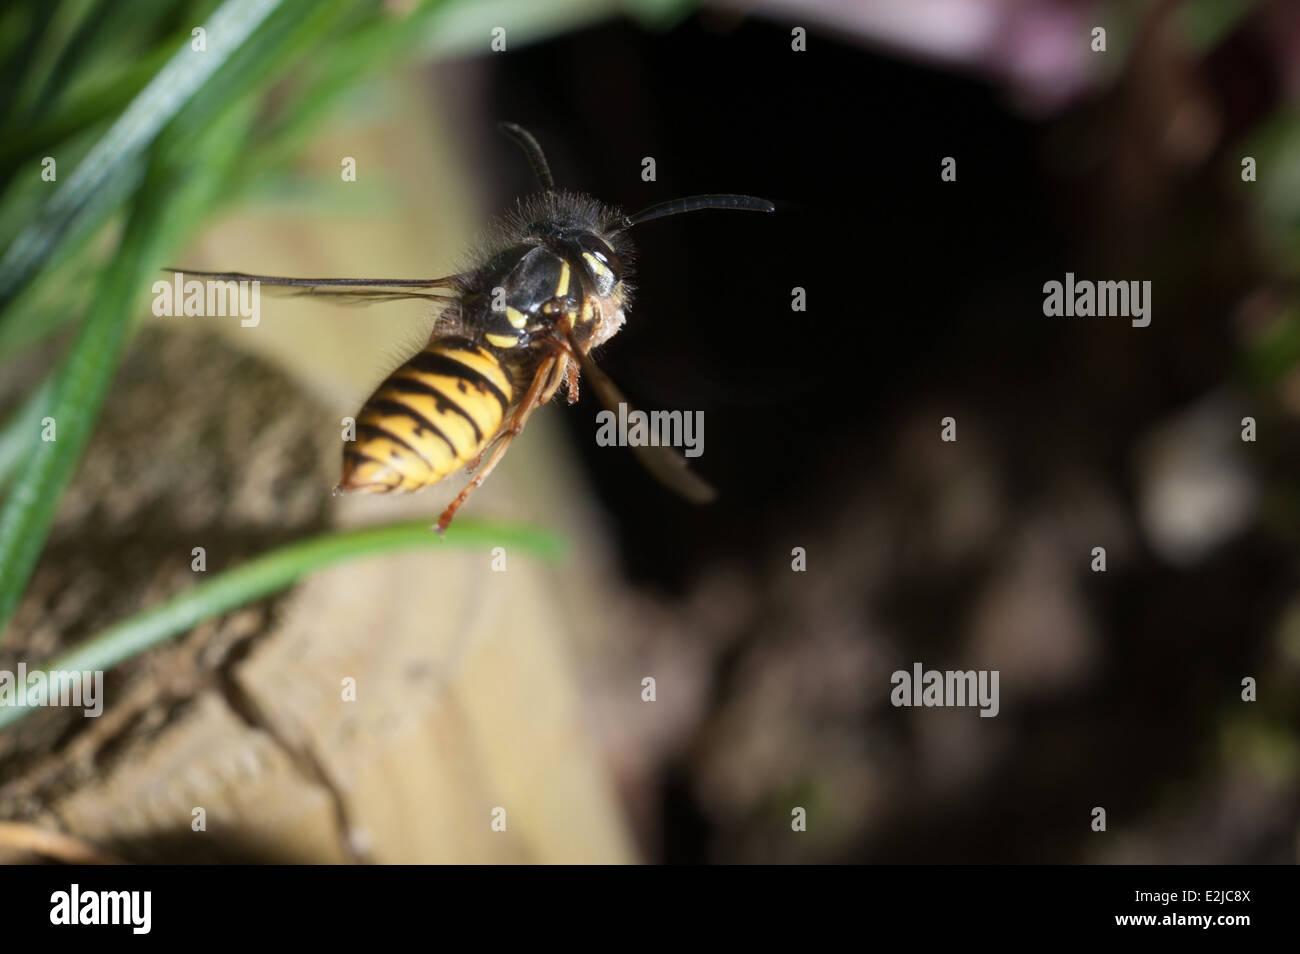 Common wasp, Vespula vulgaris. - Stock Image